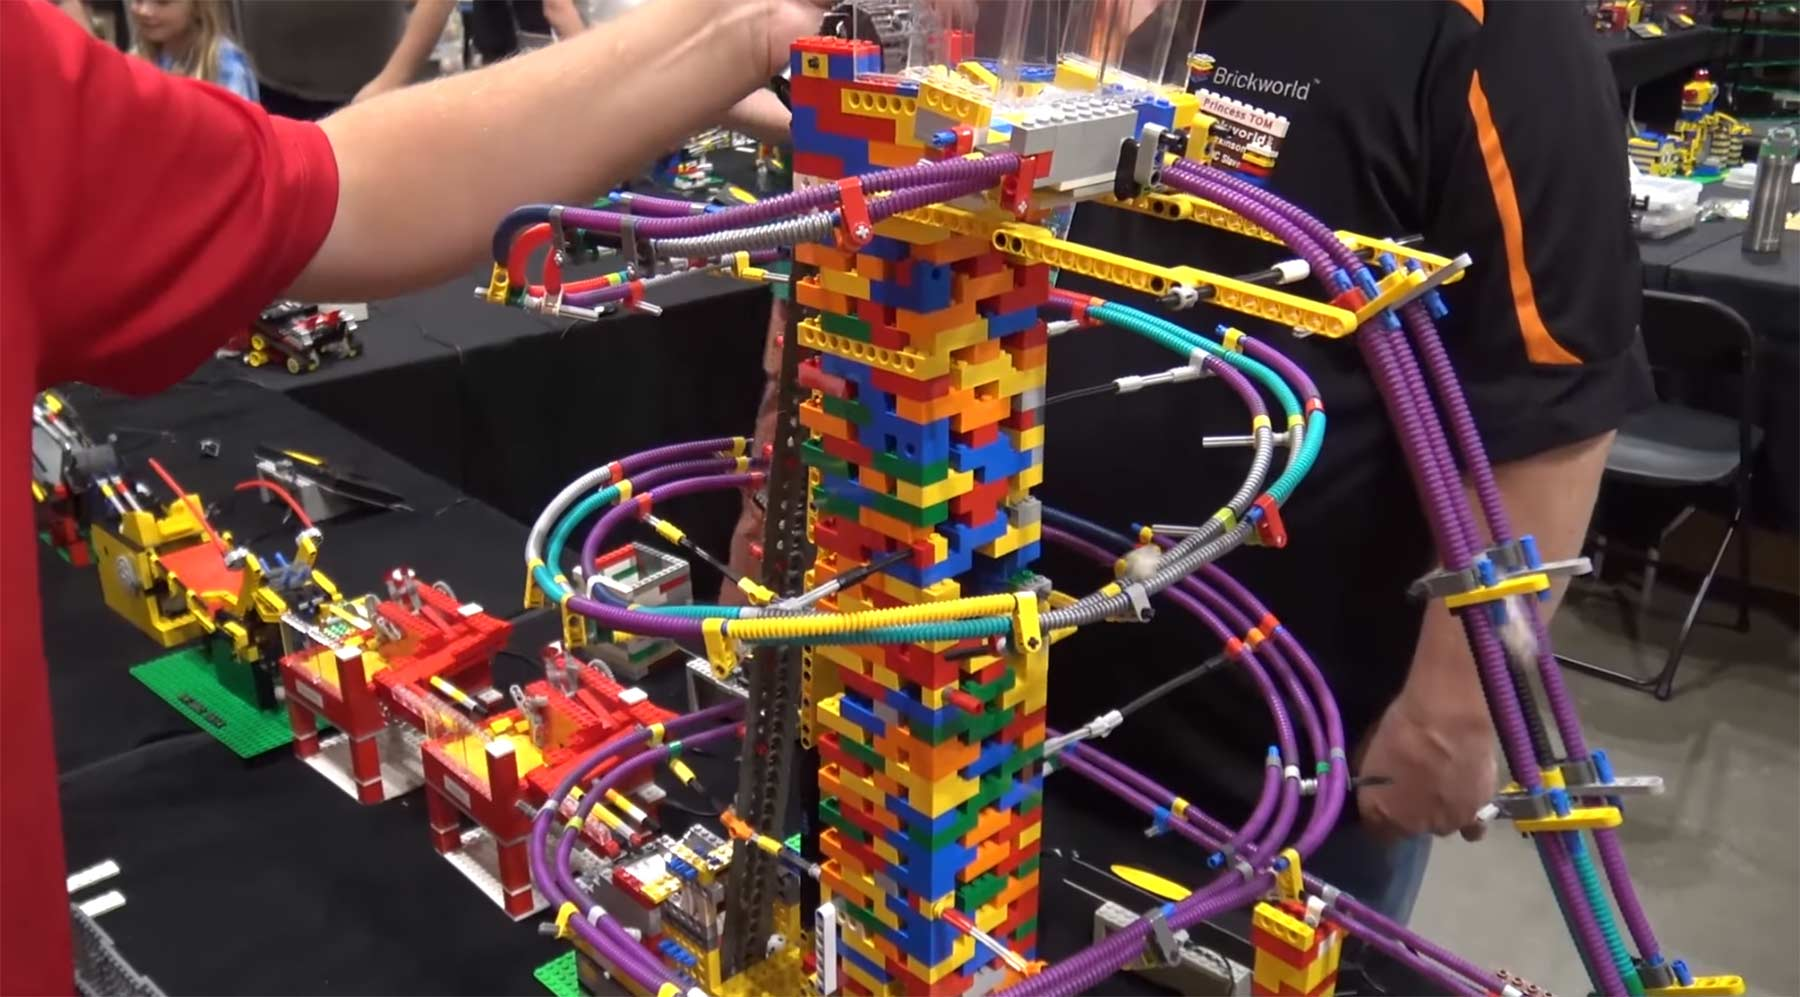 Ultralange LEGO-Ballbeförderungsmaschine